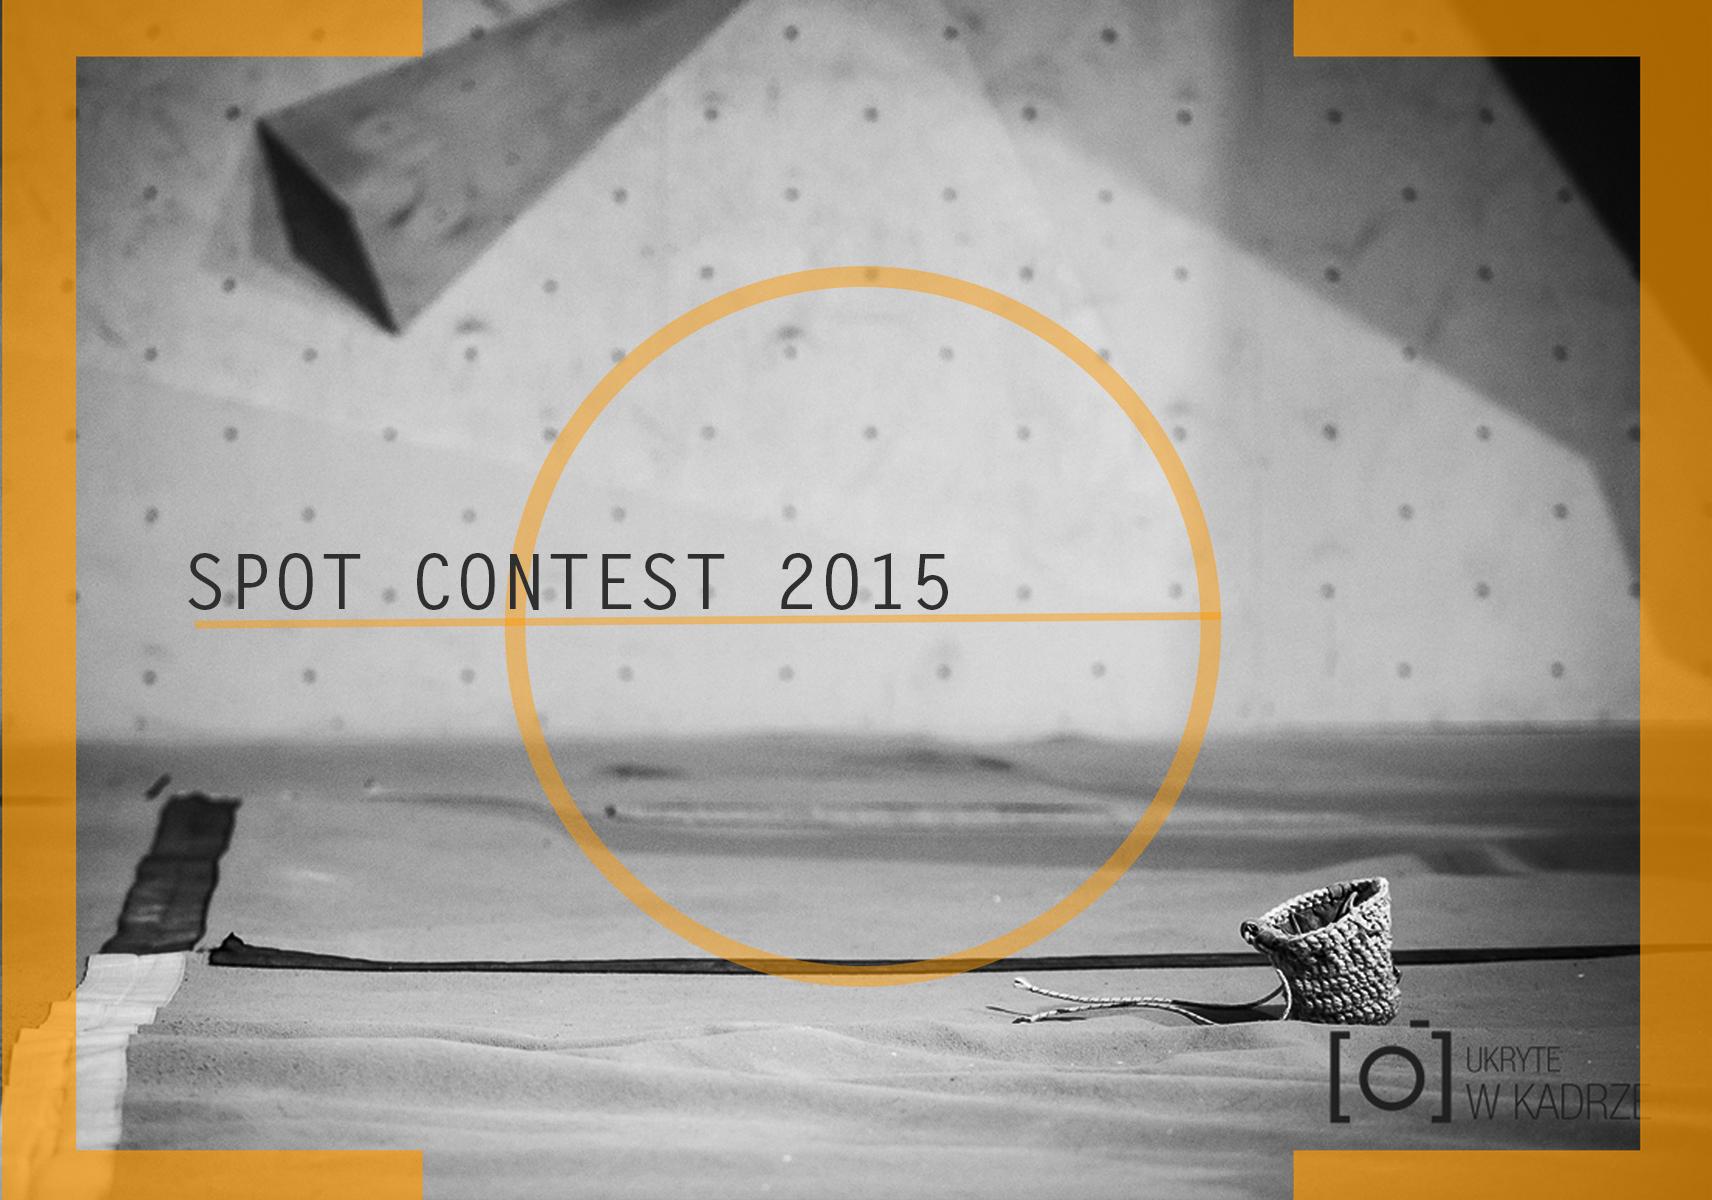 spot contest